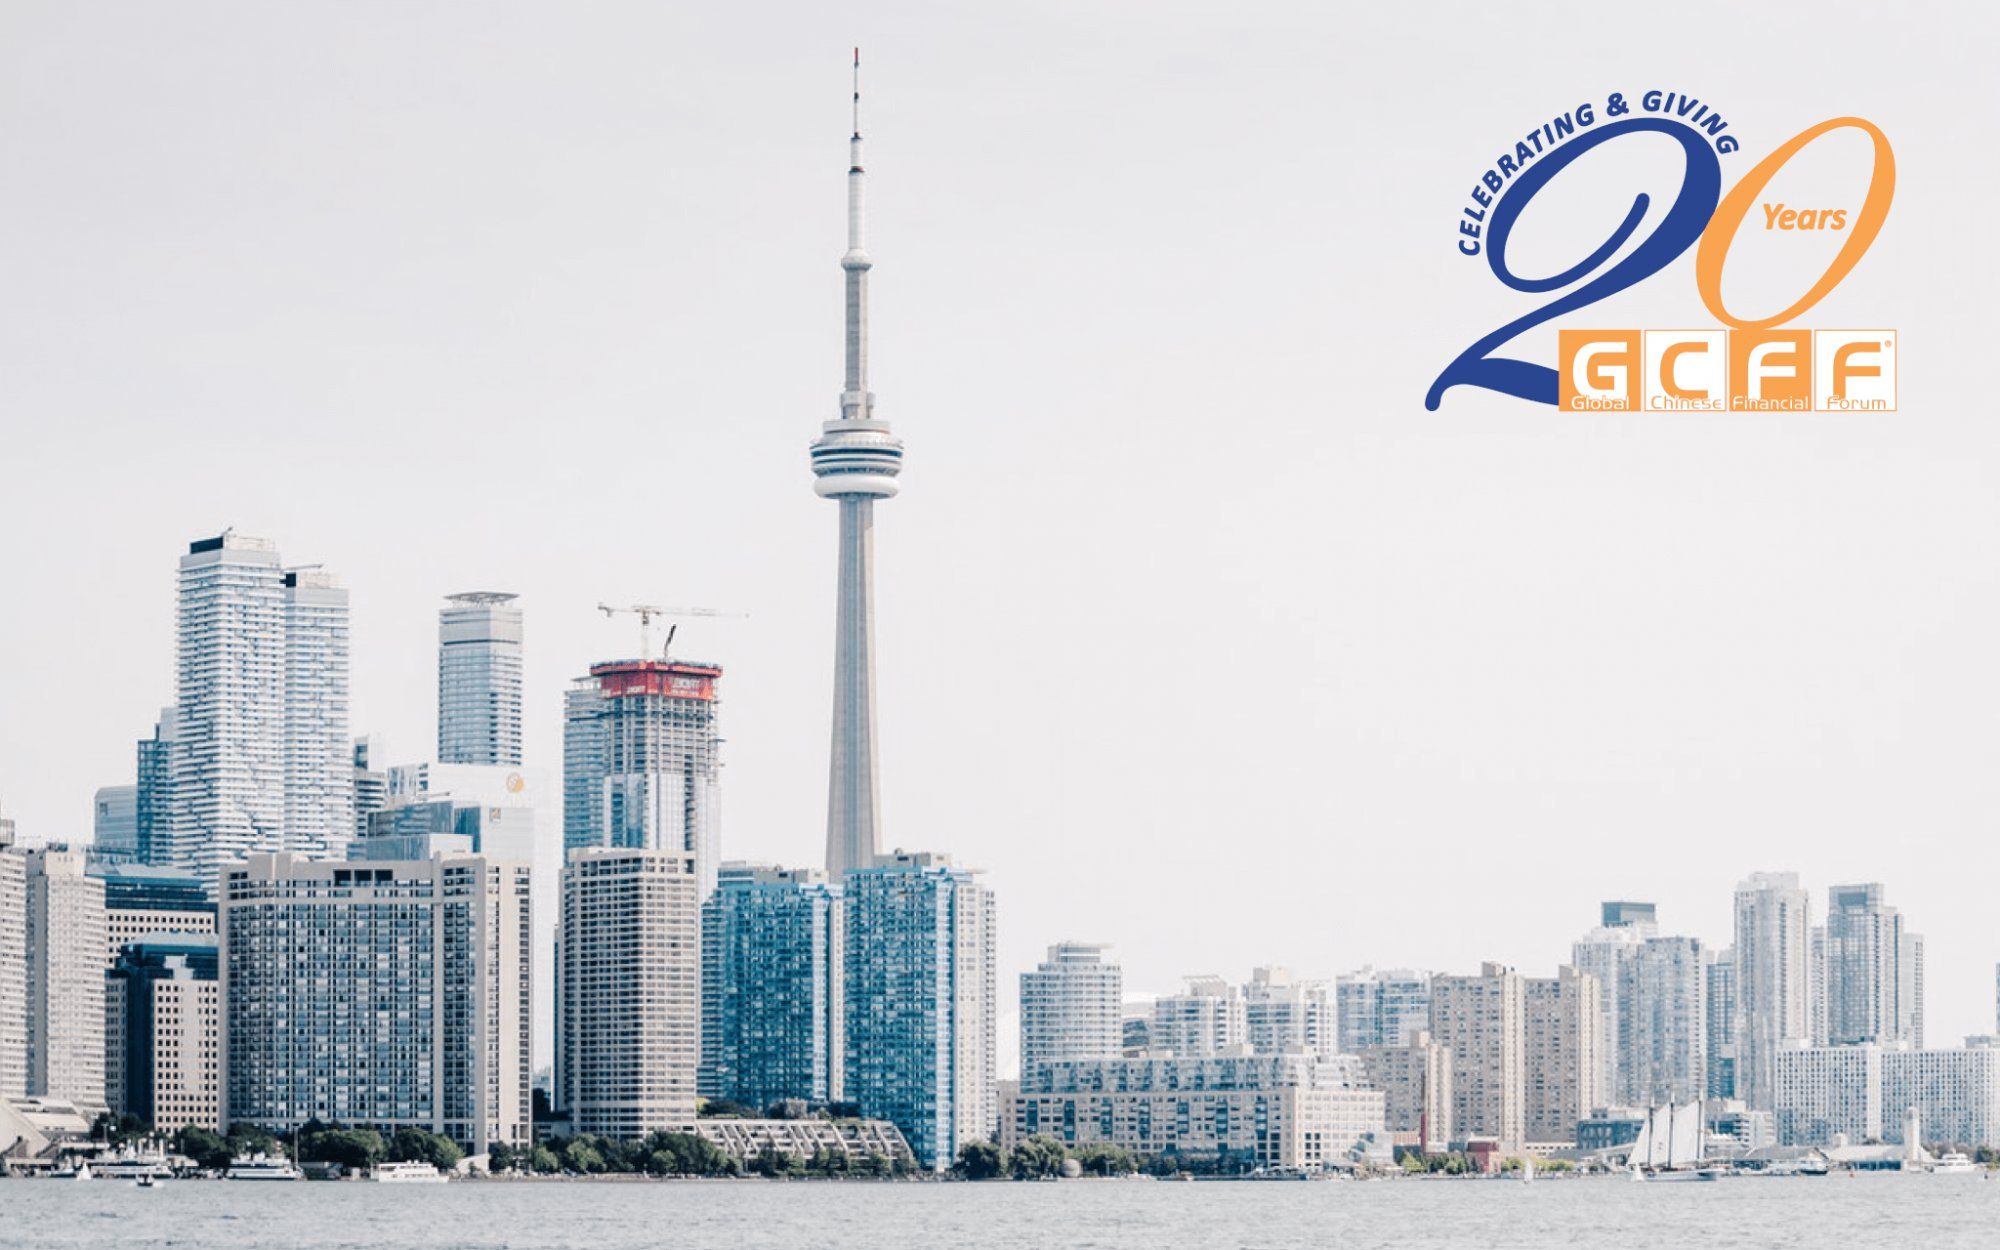 20th Annual GCFF Main Event – Vancouver